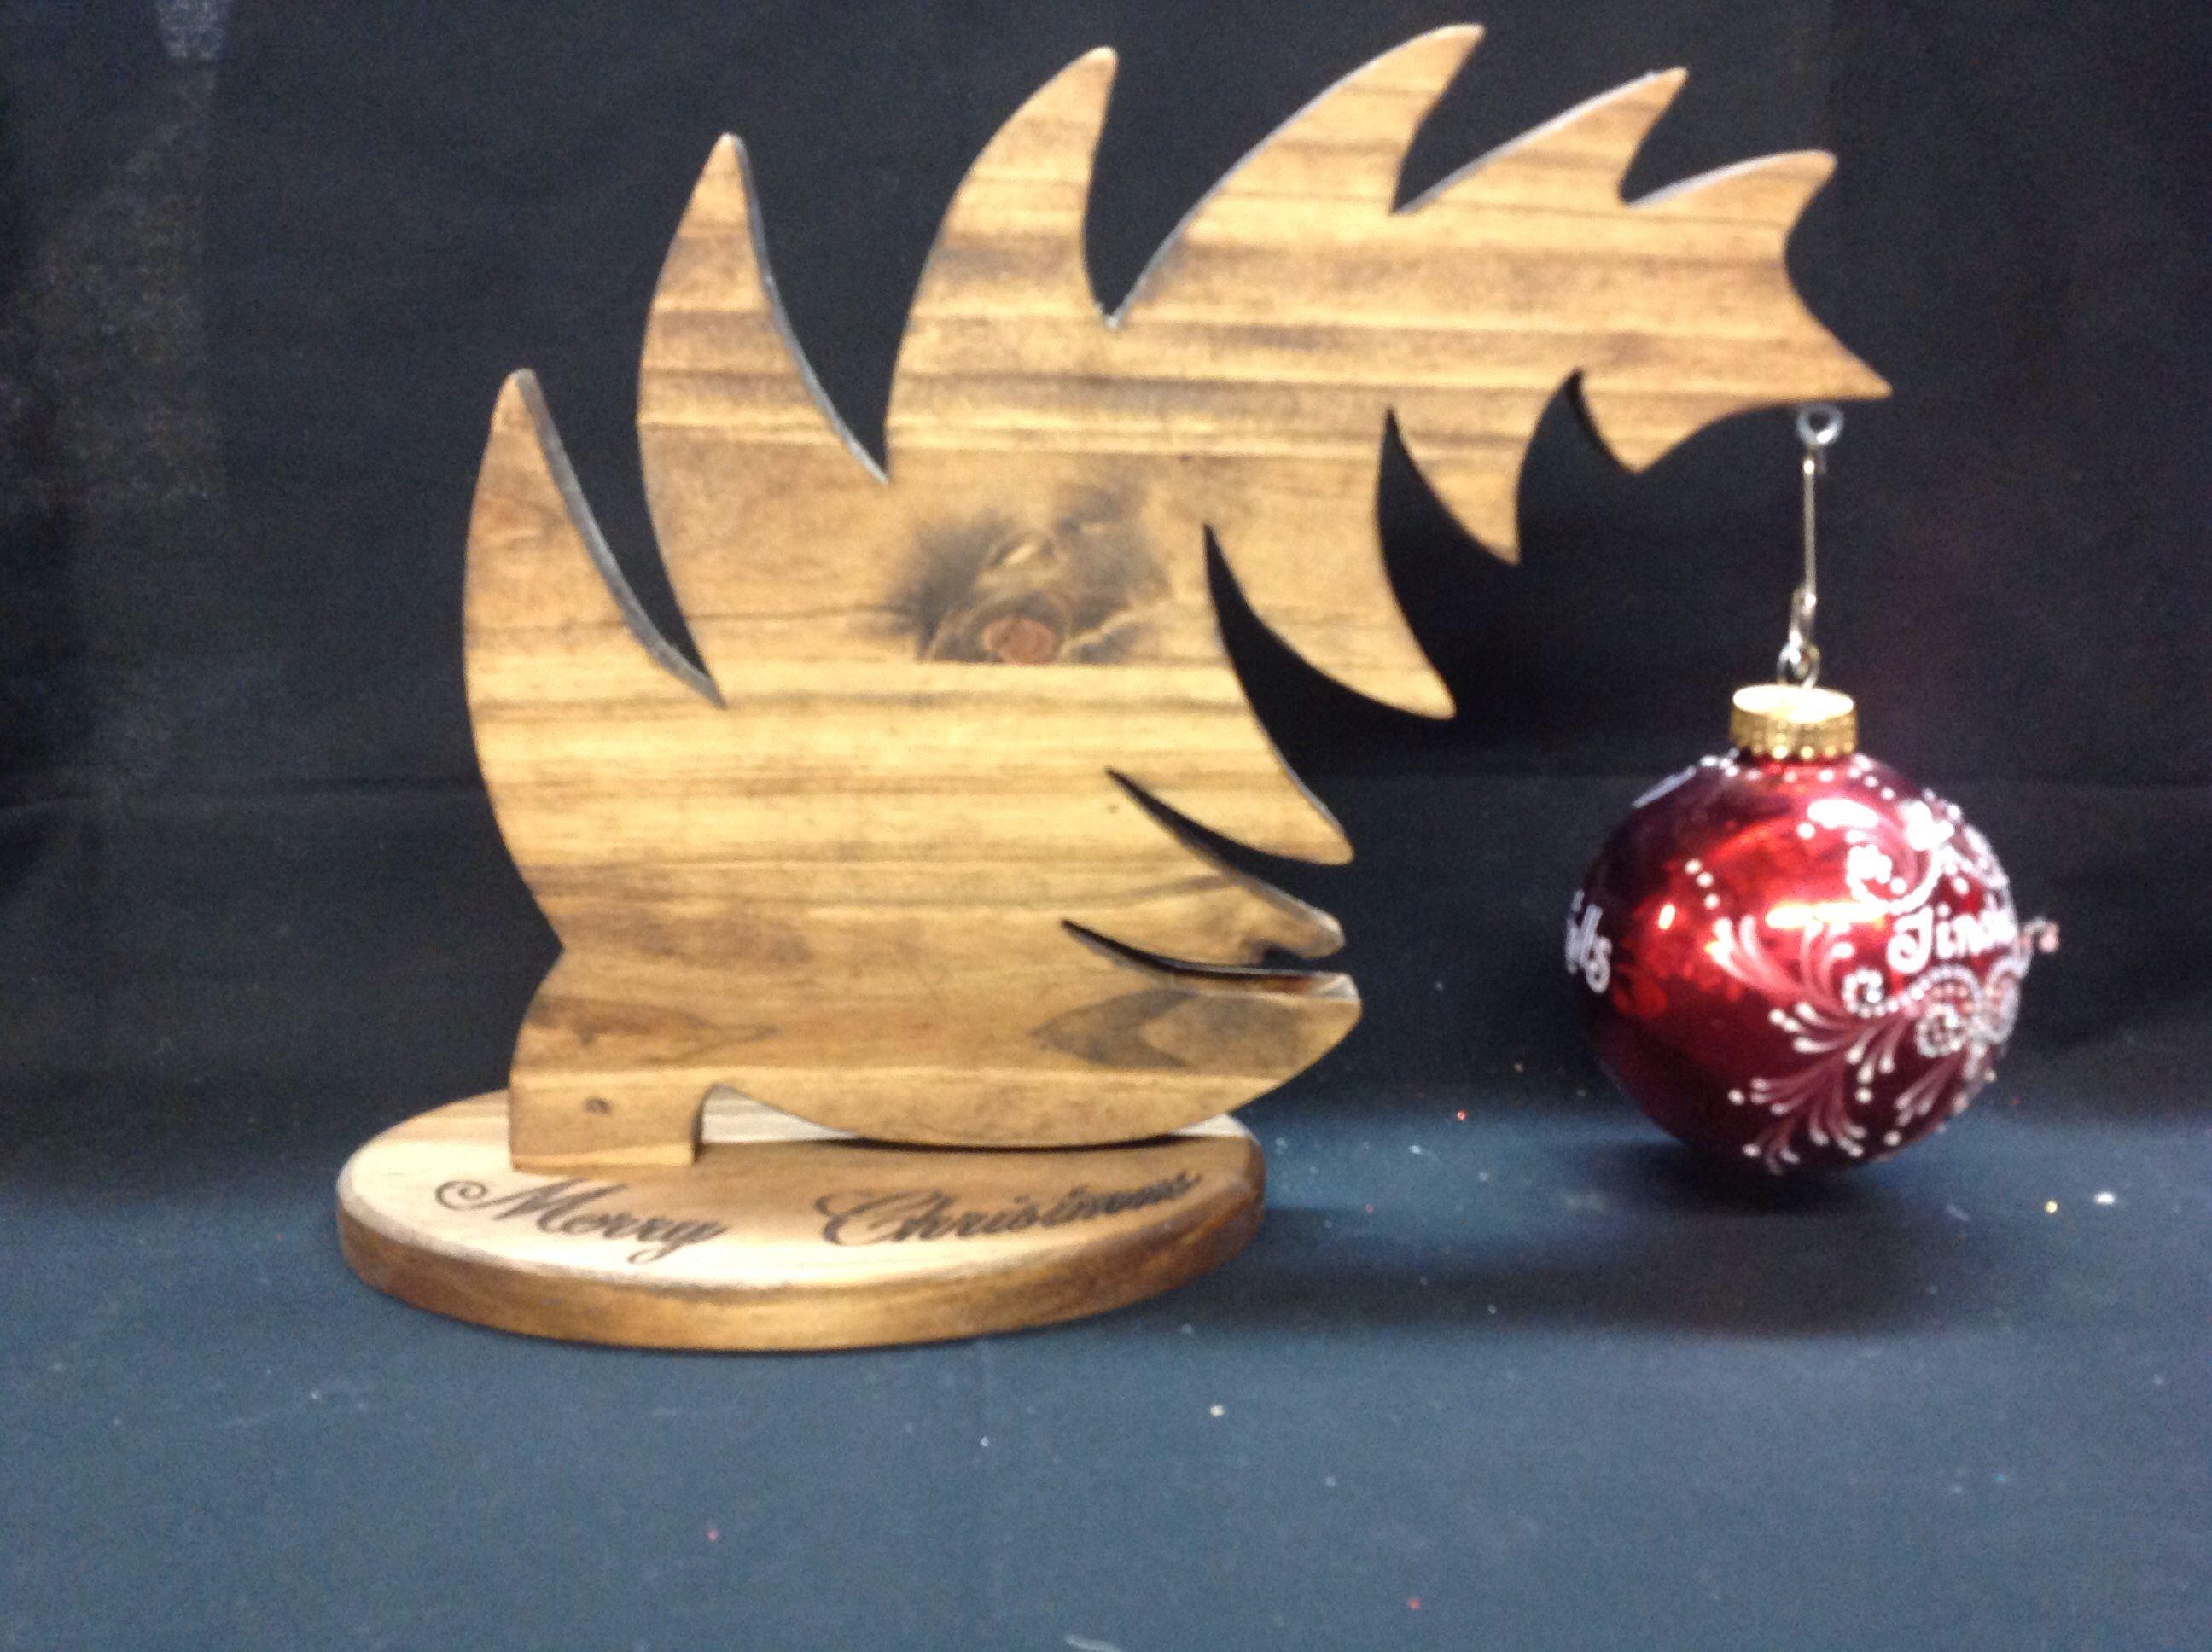 Bent Tree Ornament Holder Tree Ornaments Christmas Tree Ornaments Christmas Ornaments